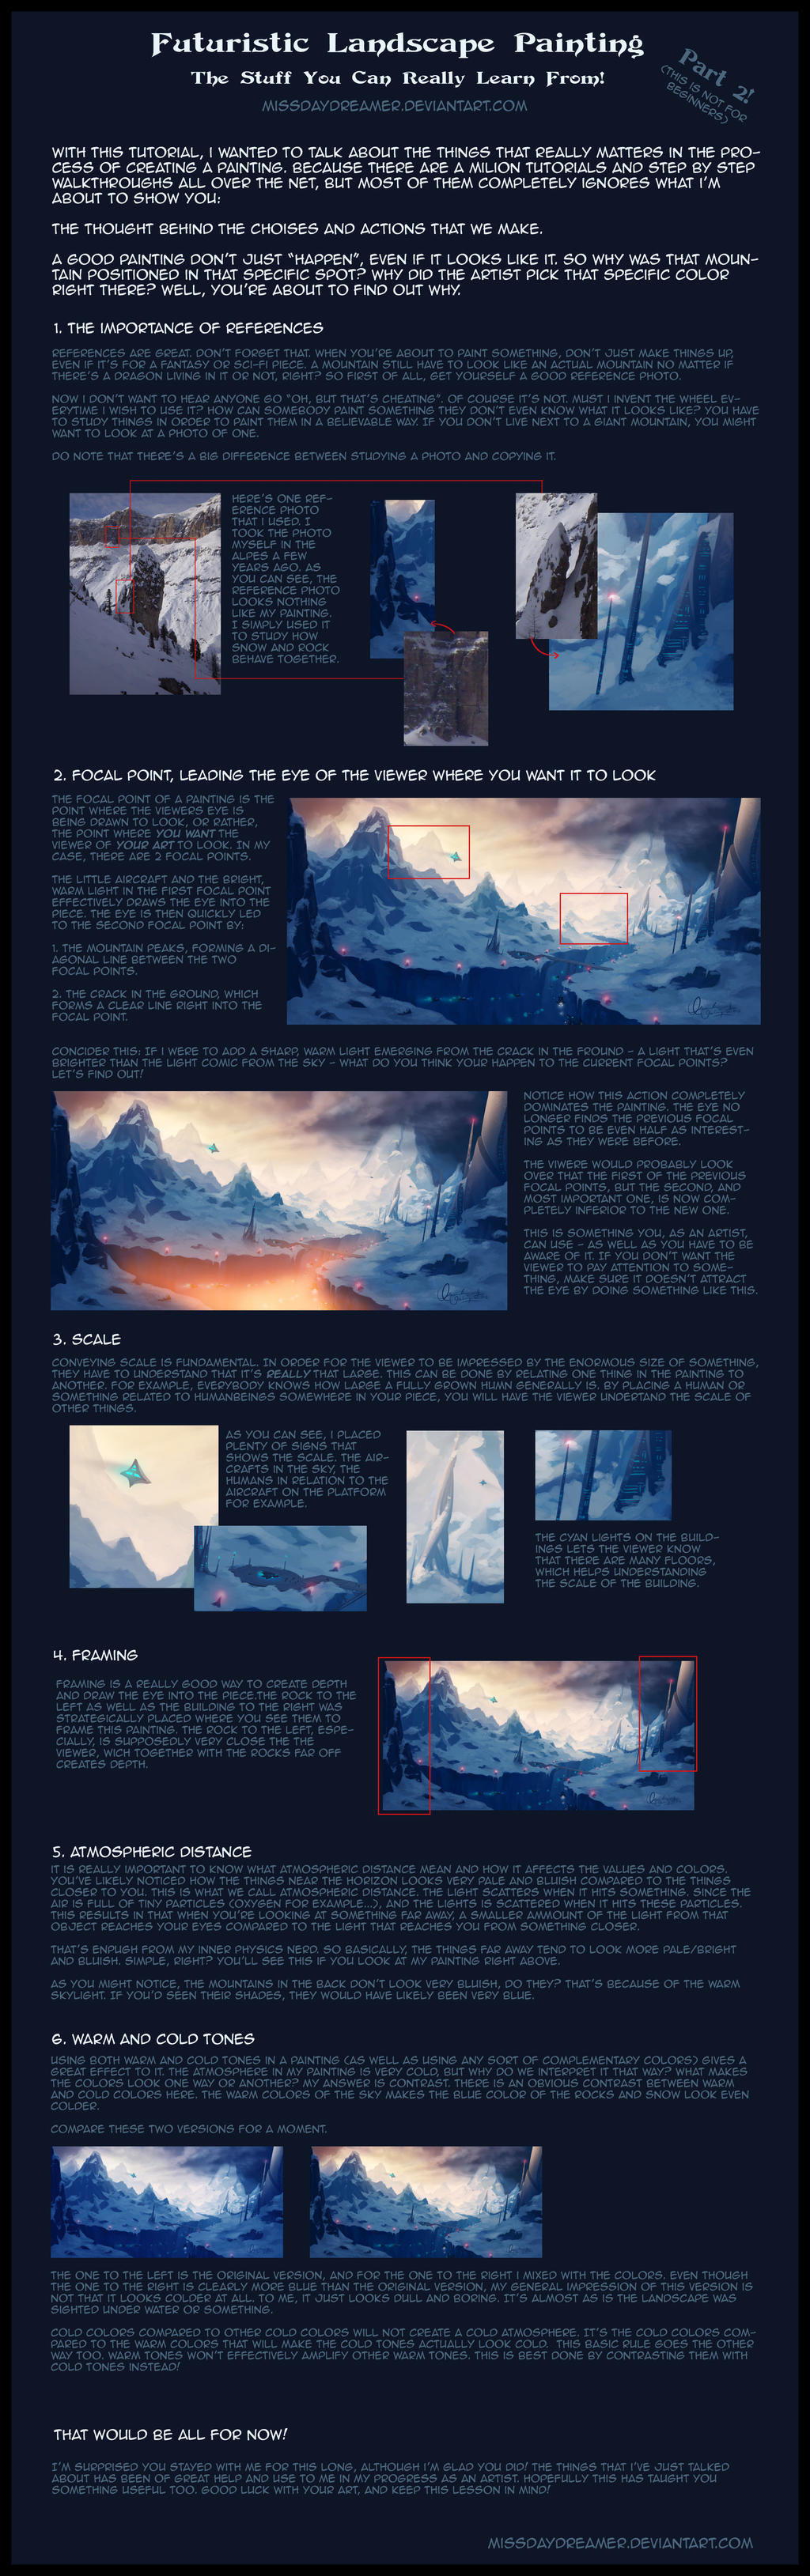 Futuristic Landscape Painting - Step By Step Part2 by Zanariya